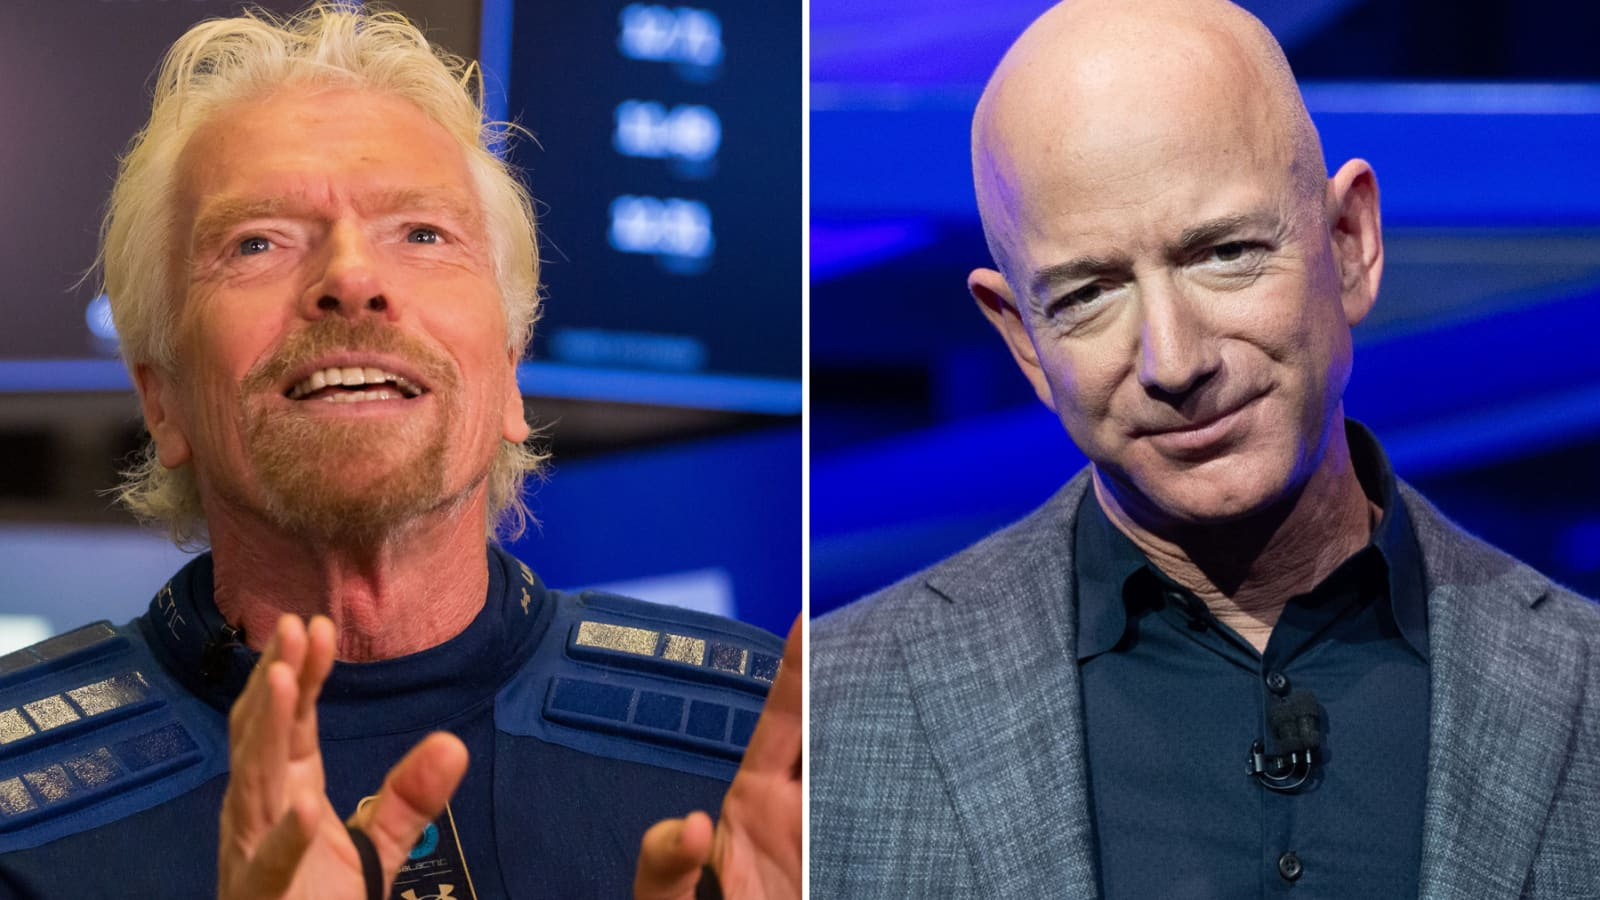 Where space begins: Bezos' Blue Origin vs. Branson's Virgin Galactic